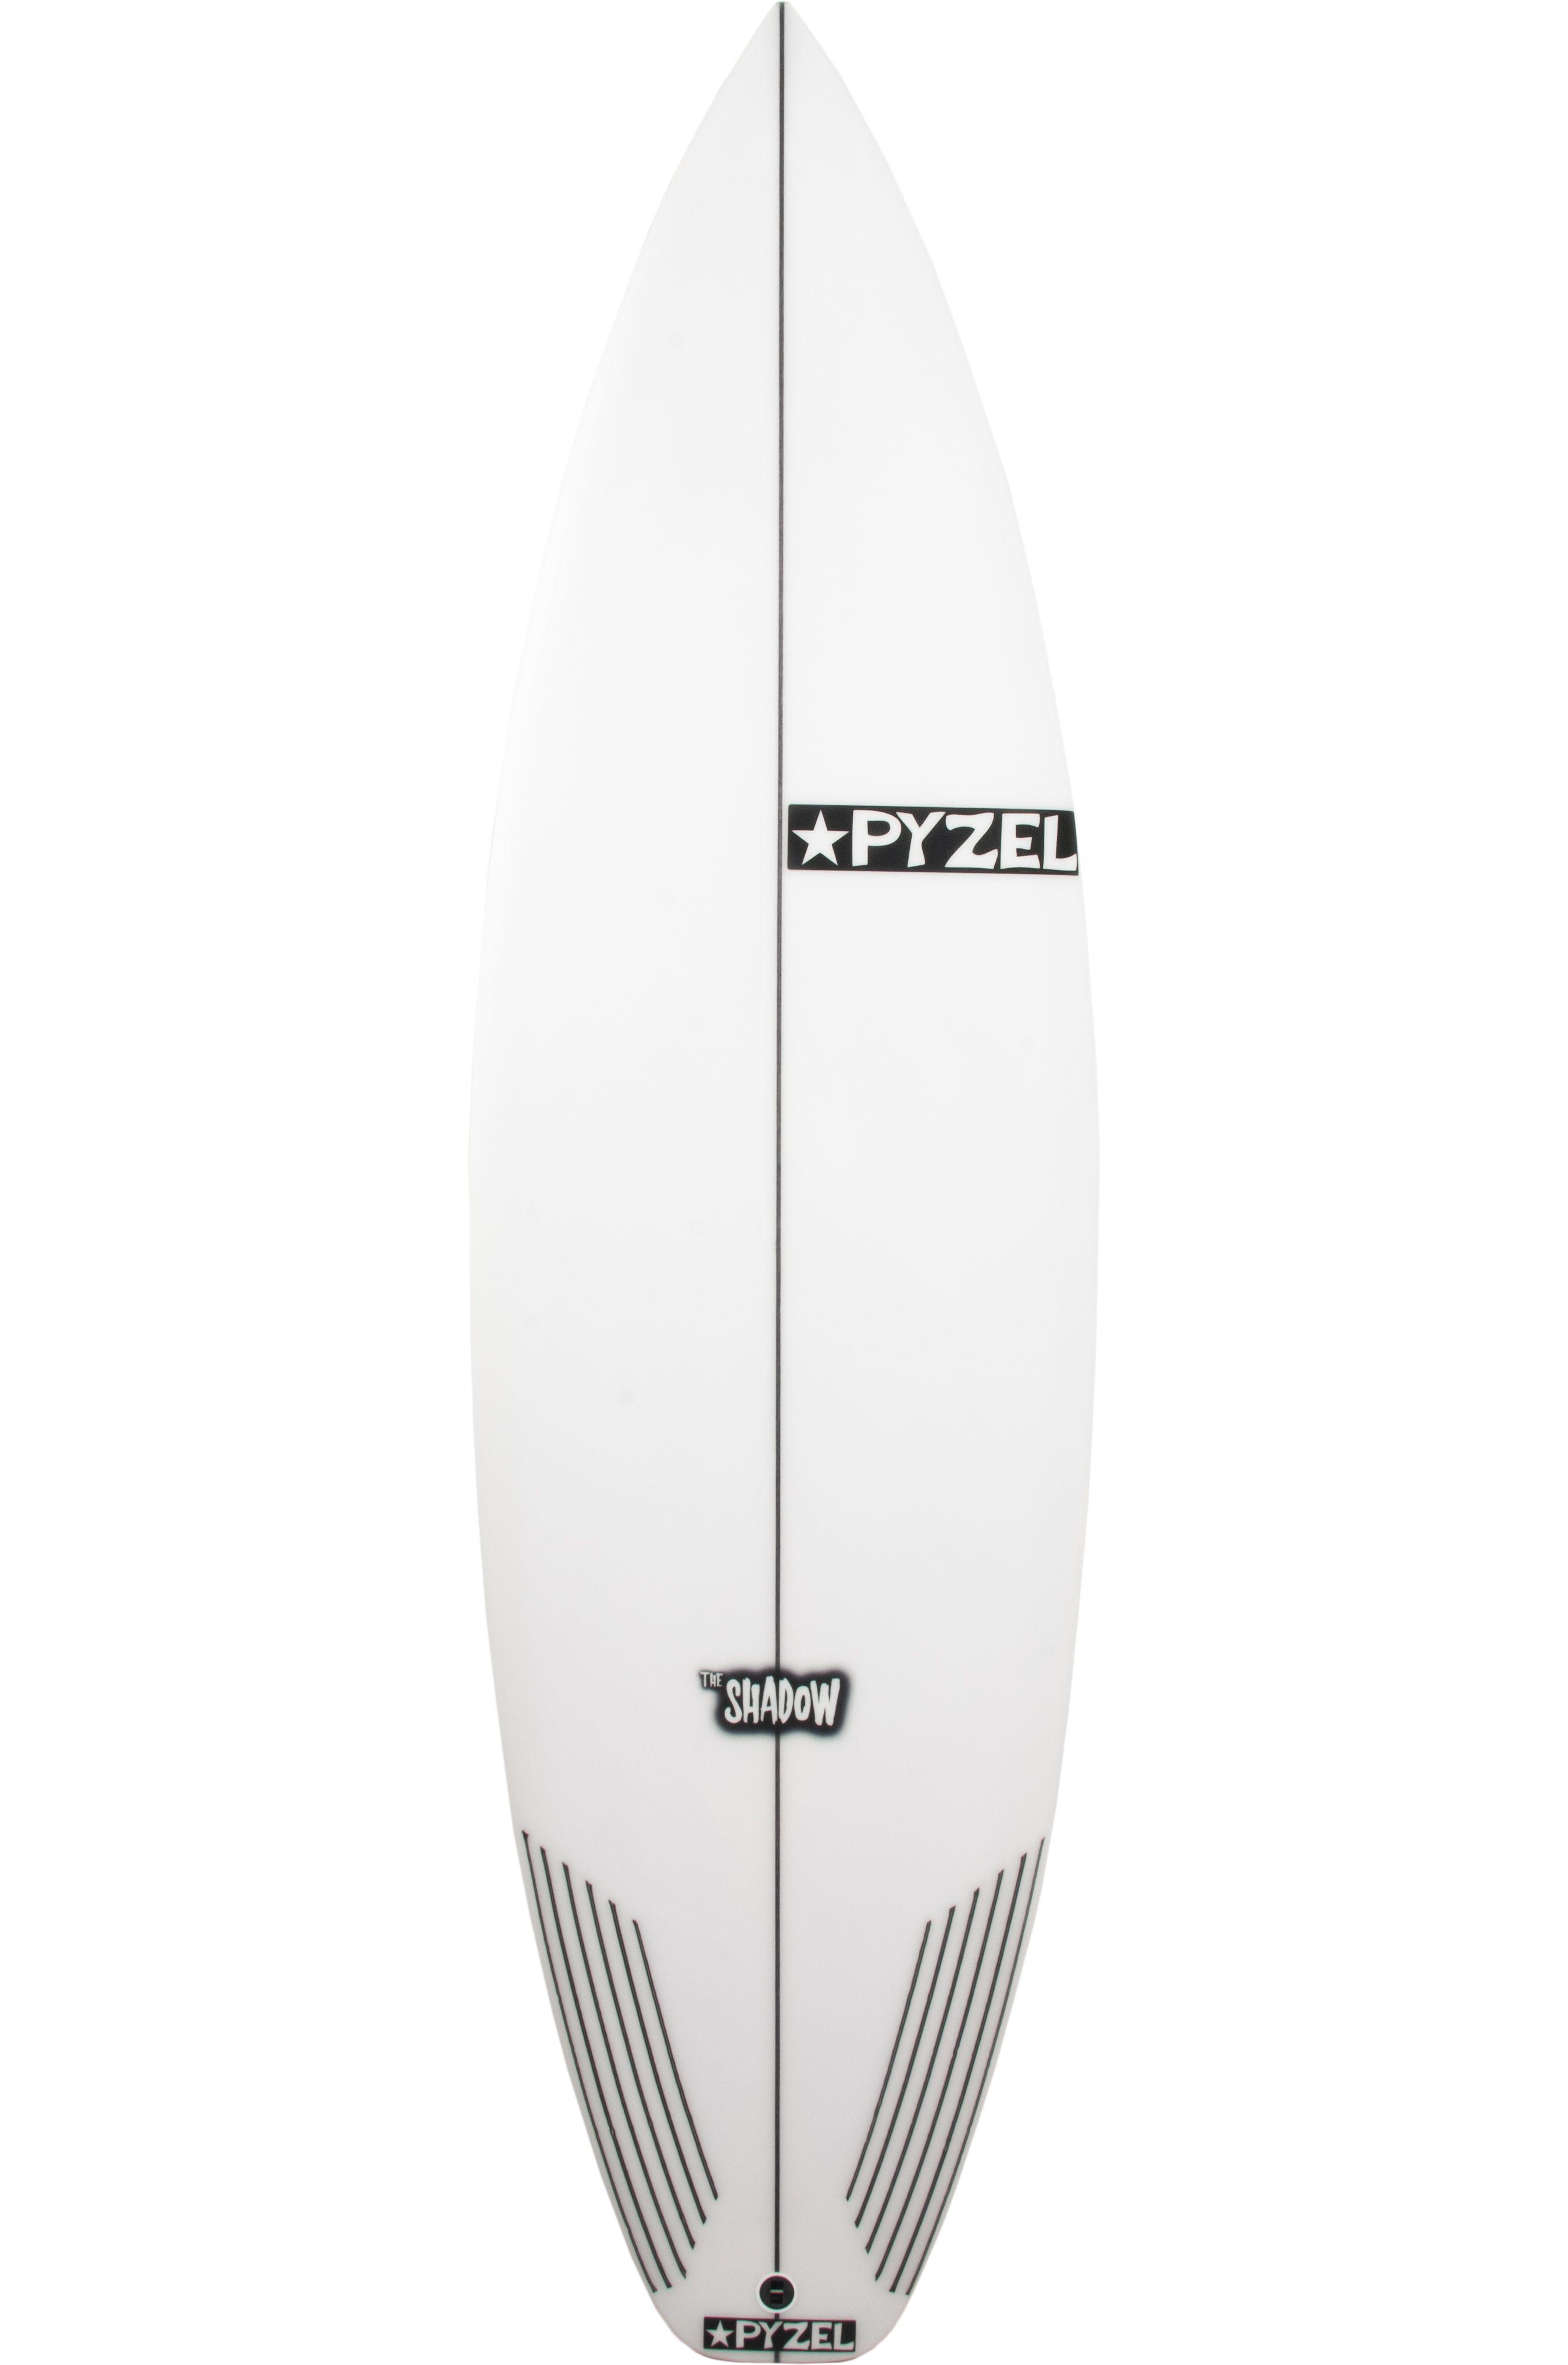 Prancha Surf Pyzel SHADOW 5'11 Squash Tail - White FCS II 5ft11